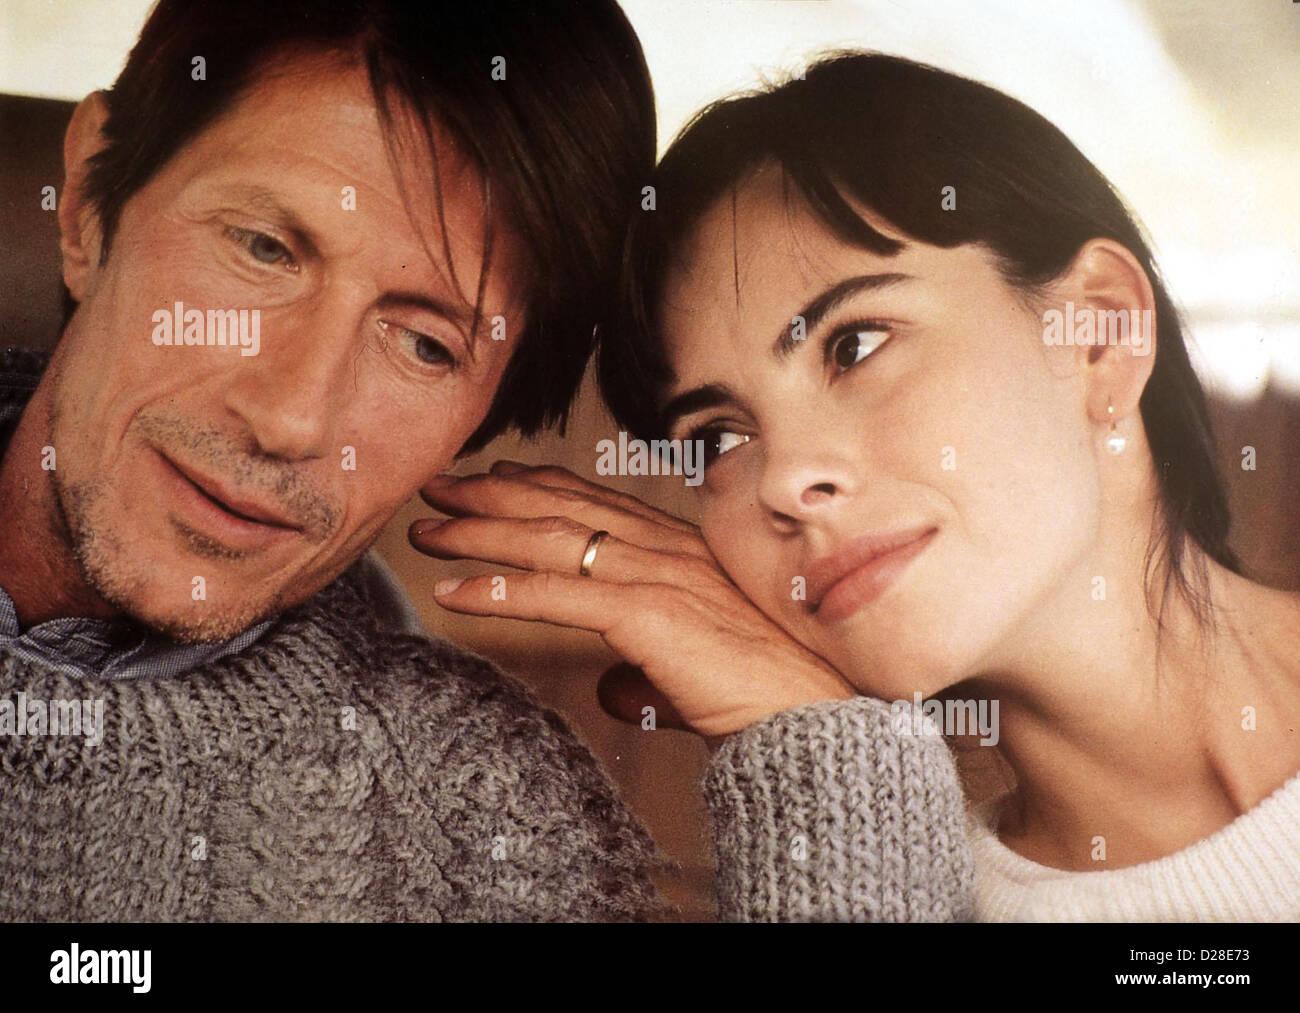 Sweetheart   Toutes Peines Confondues   Gardella (Jacques Dutronc) und Jeanne (Mathilda May) *** Local Caption *** - Stock Image